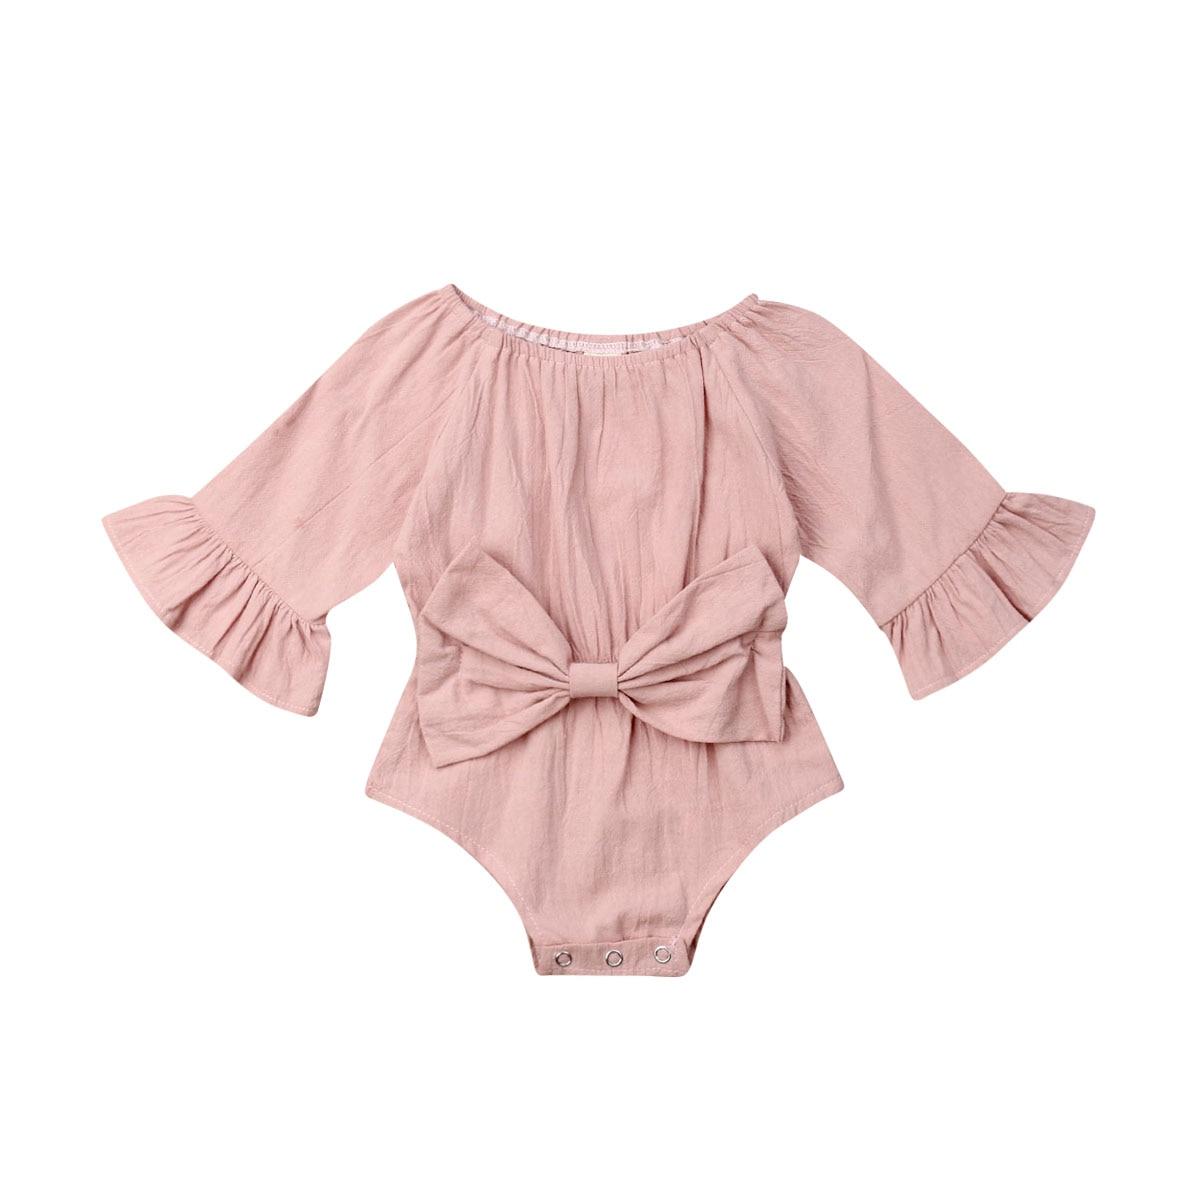 Peleles de manga larga para bebés recién nacidos, mono con lazo, mono de otoño, primavera, ropa de Disfraces para Niñas